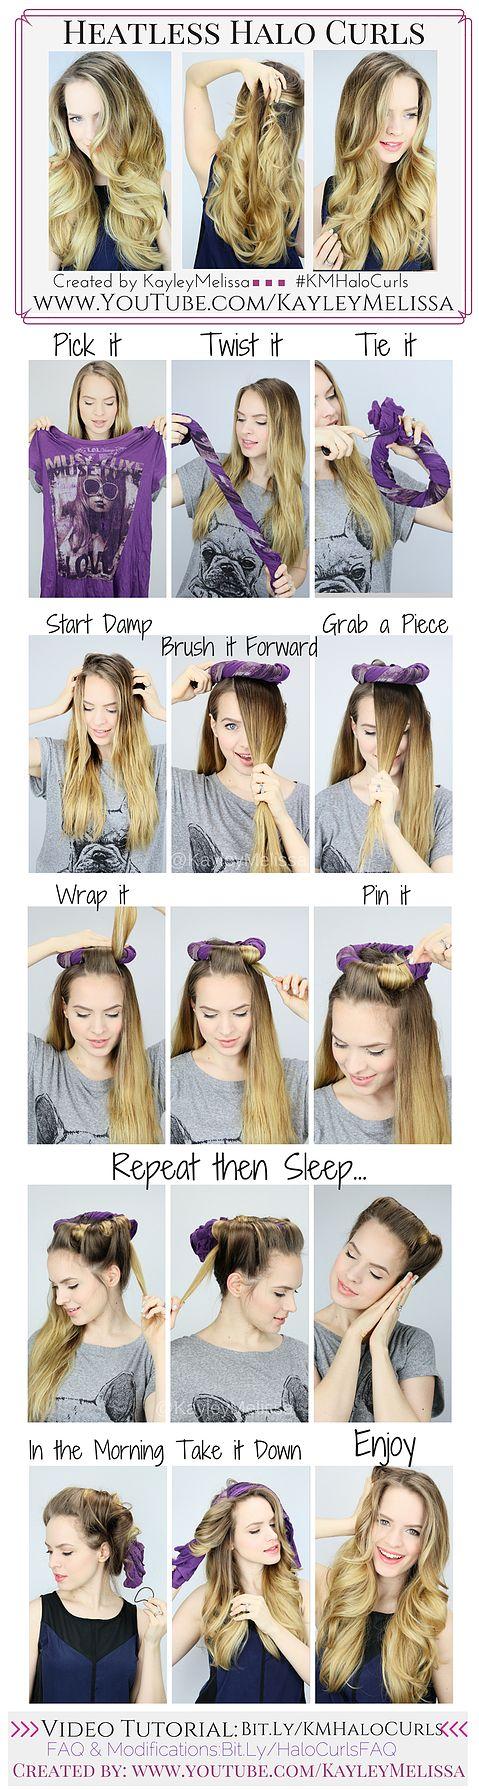 How to Achieve Gorgeous Heatless Curls | Heatless Halo Curls